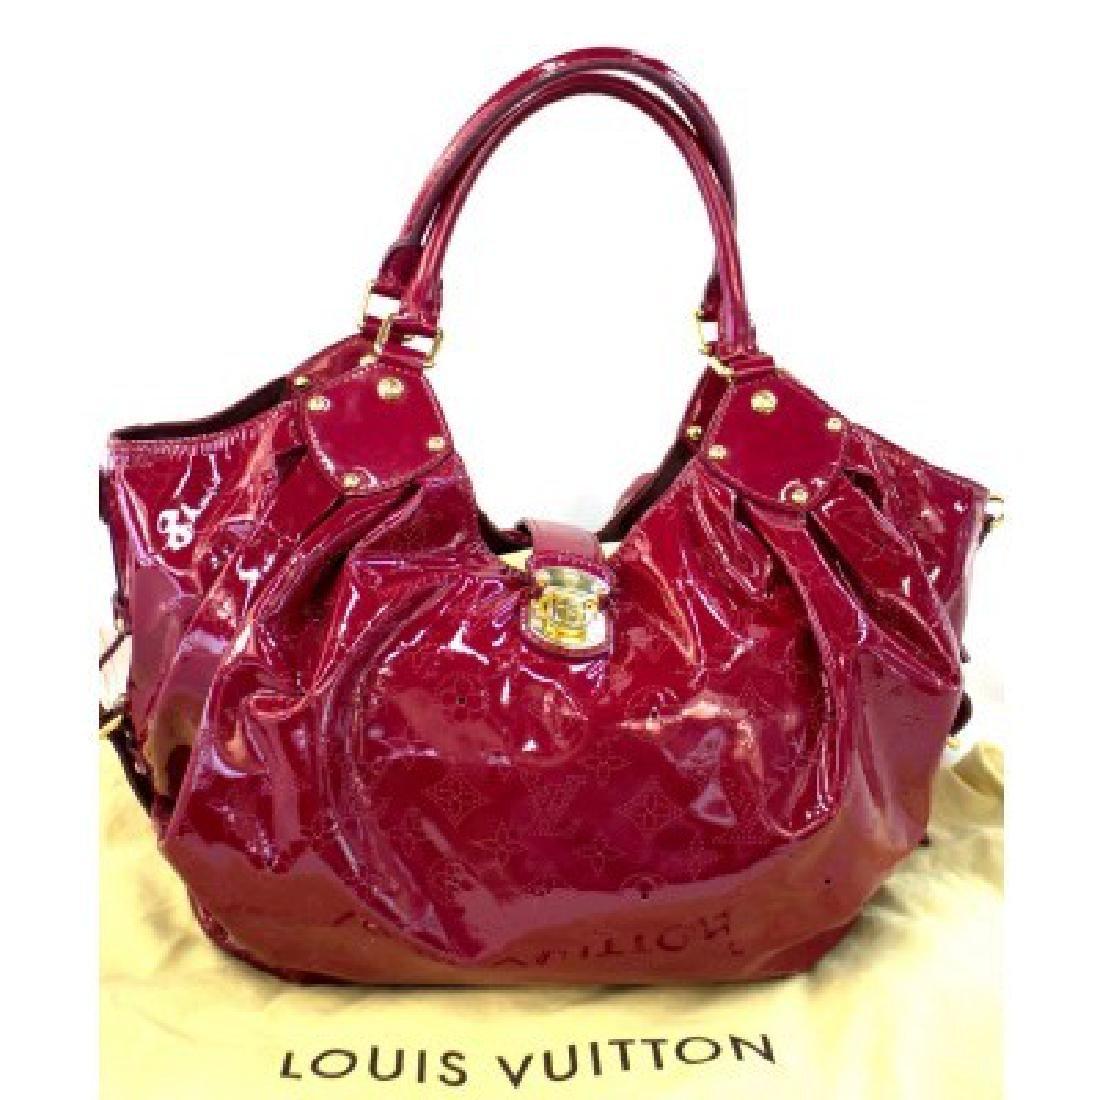 Louis Vuitton Surya XL Handbag